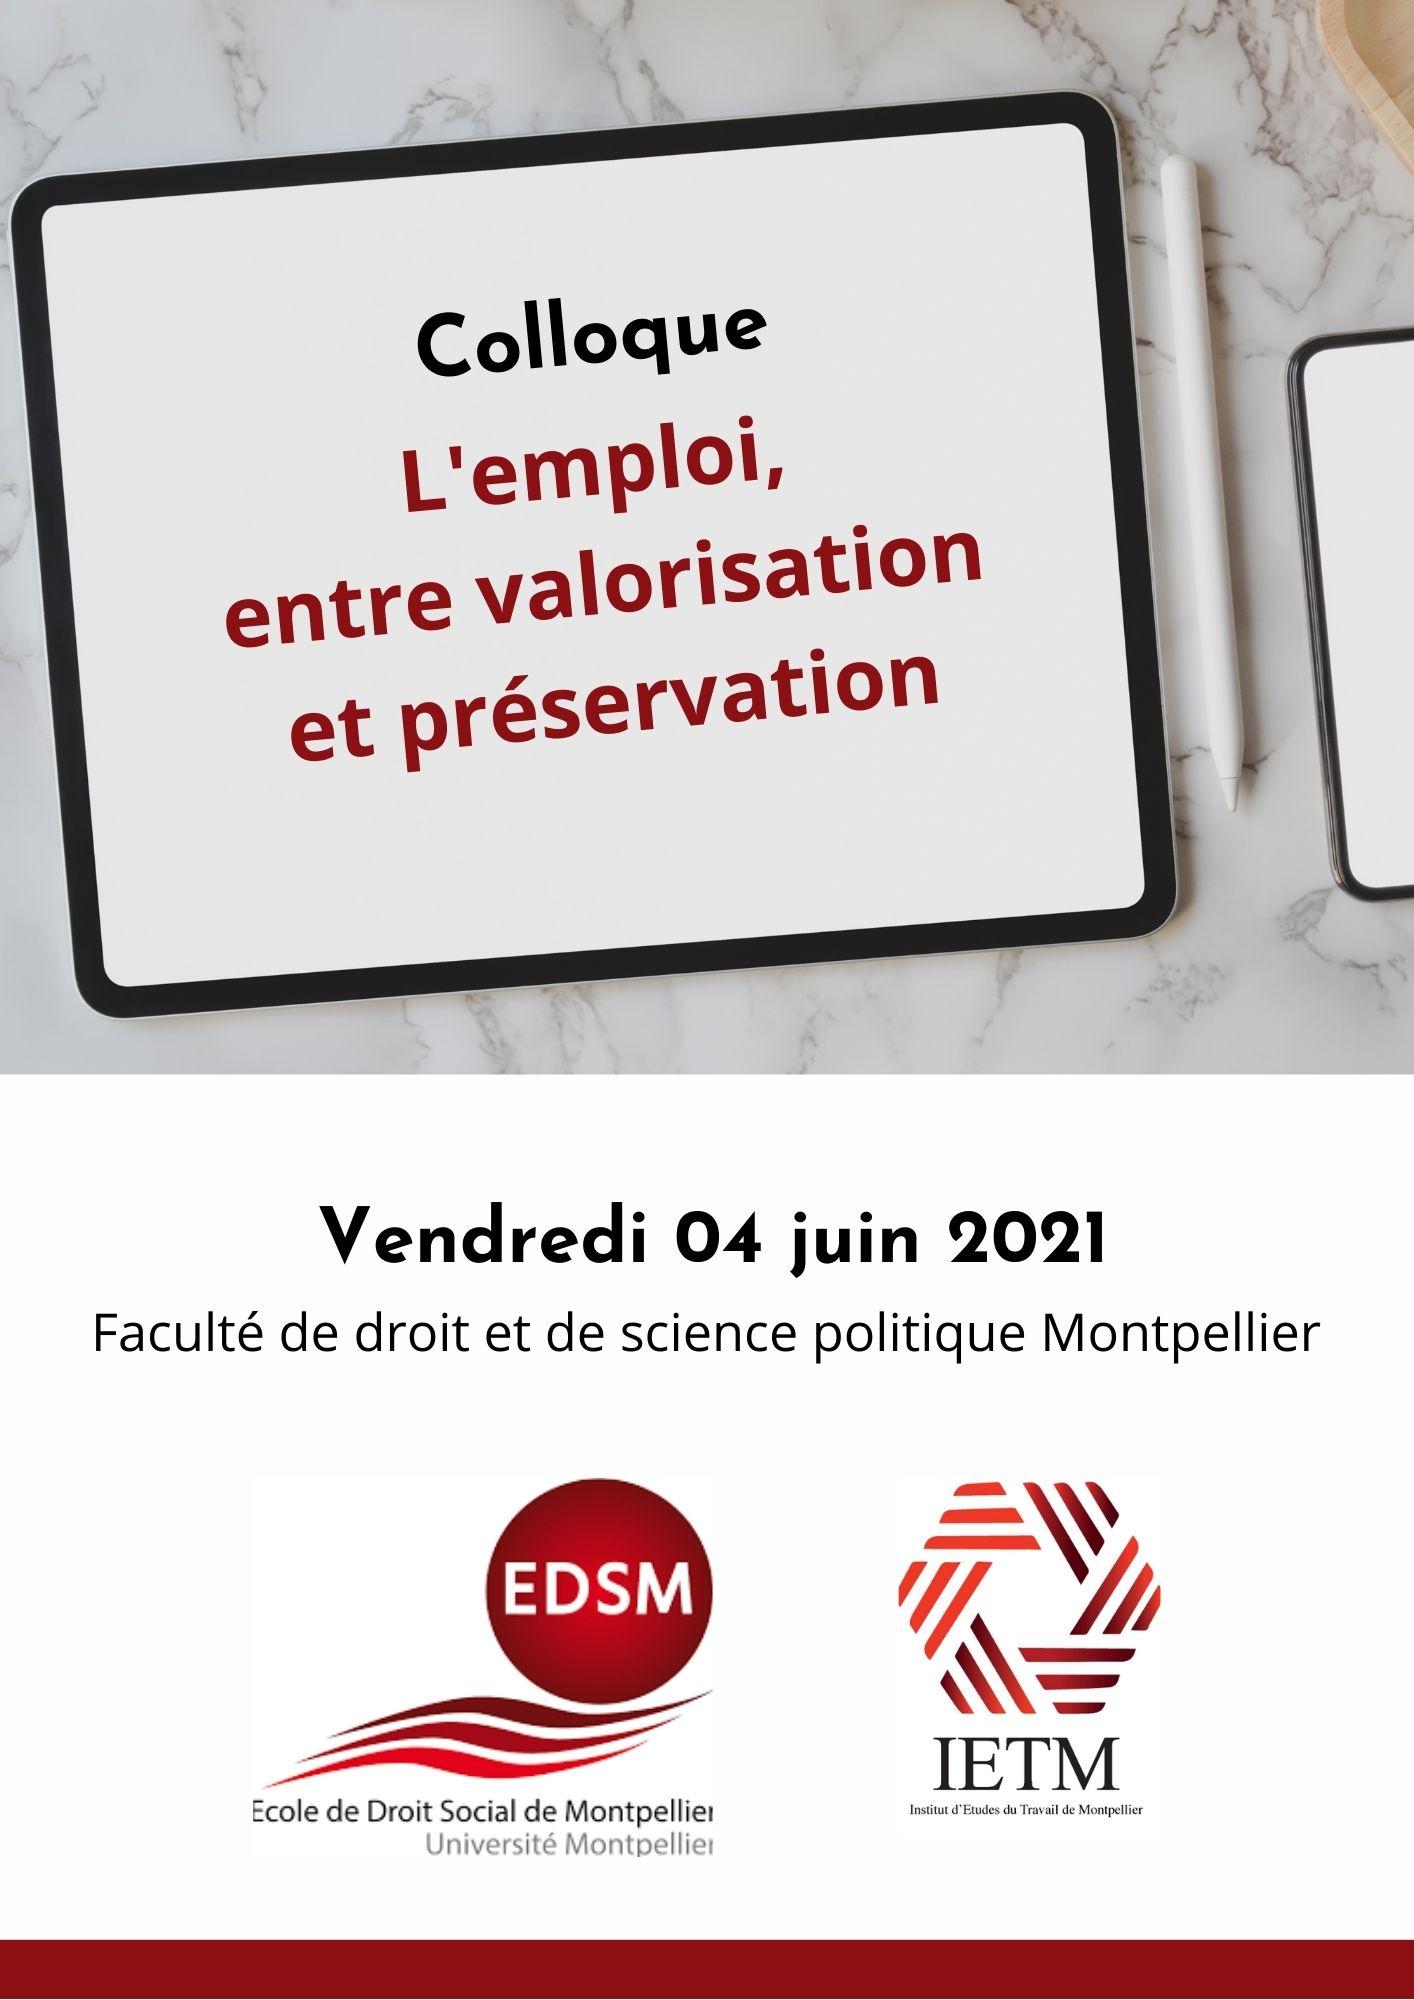 Colloque annuel de l'EDSM